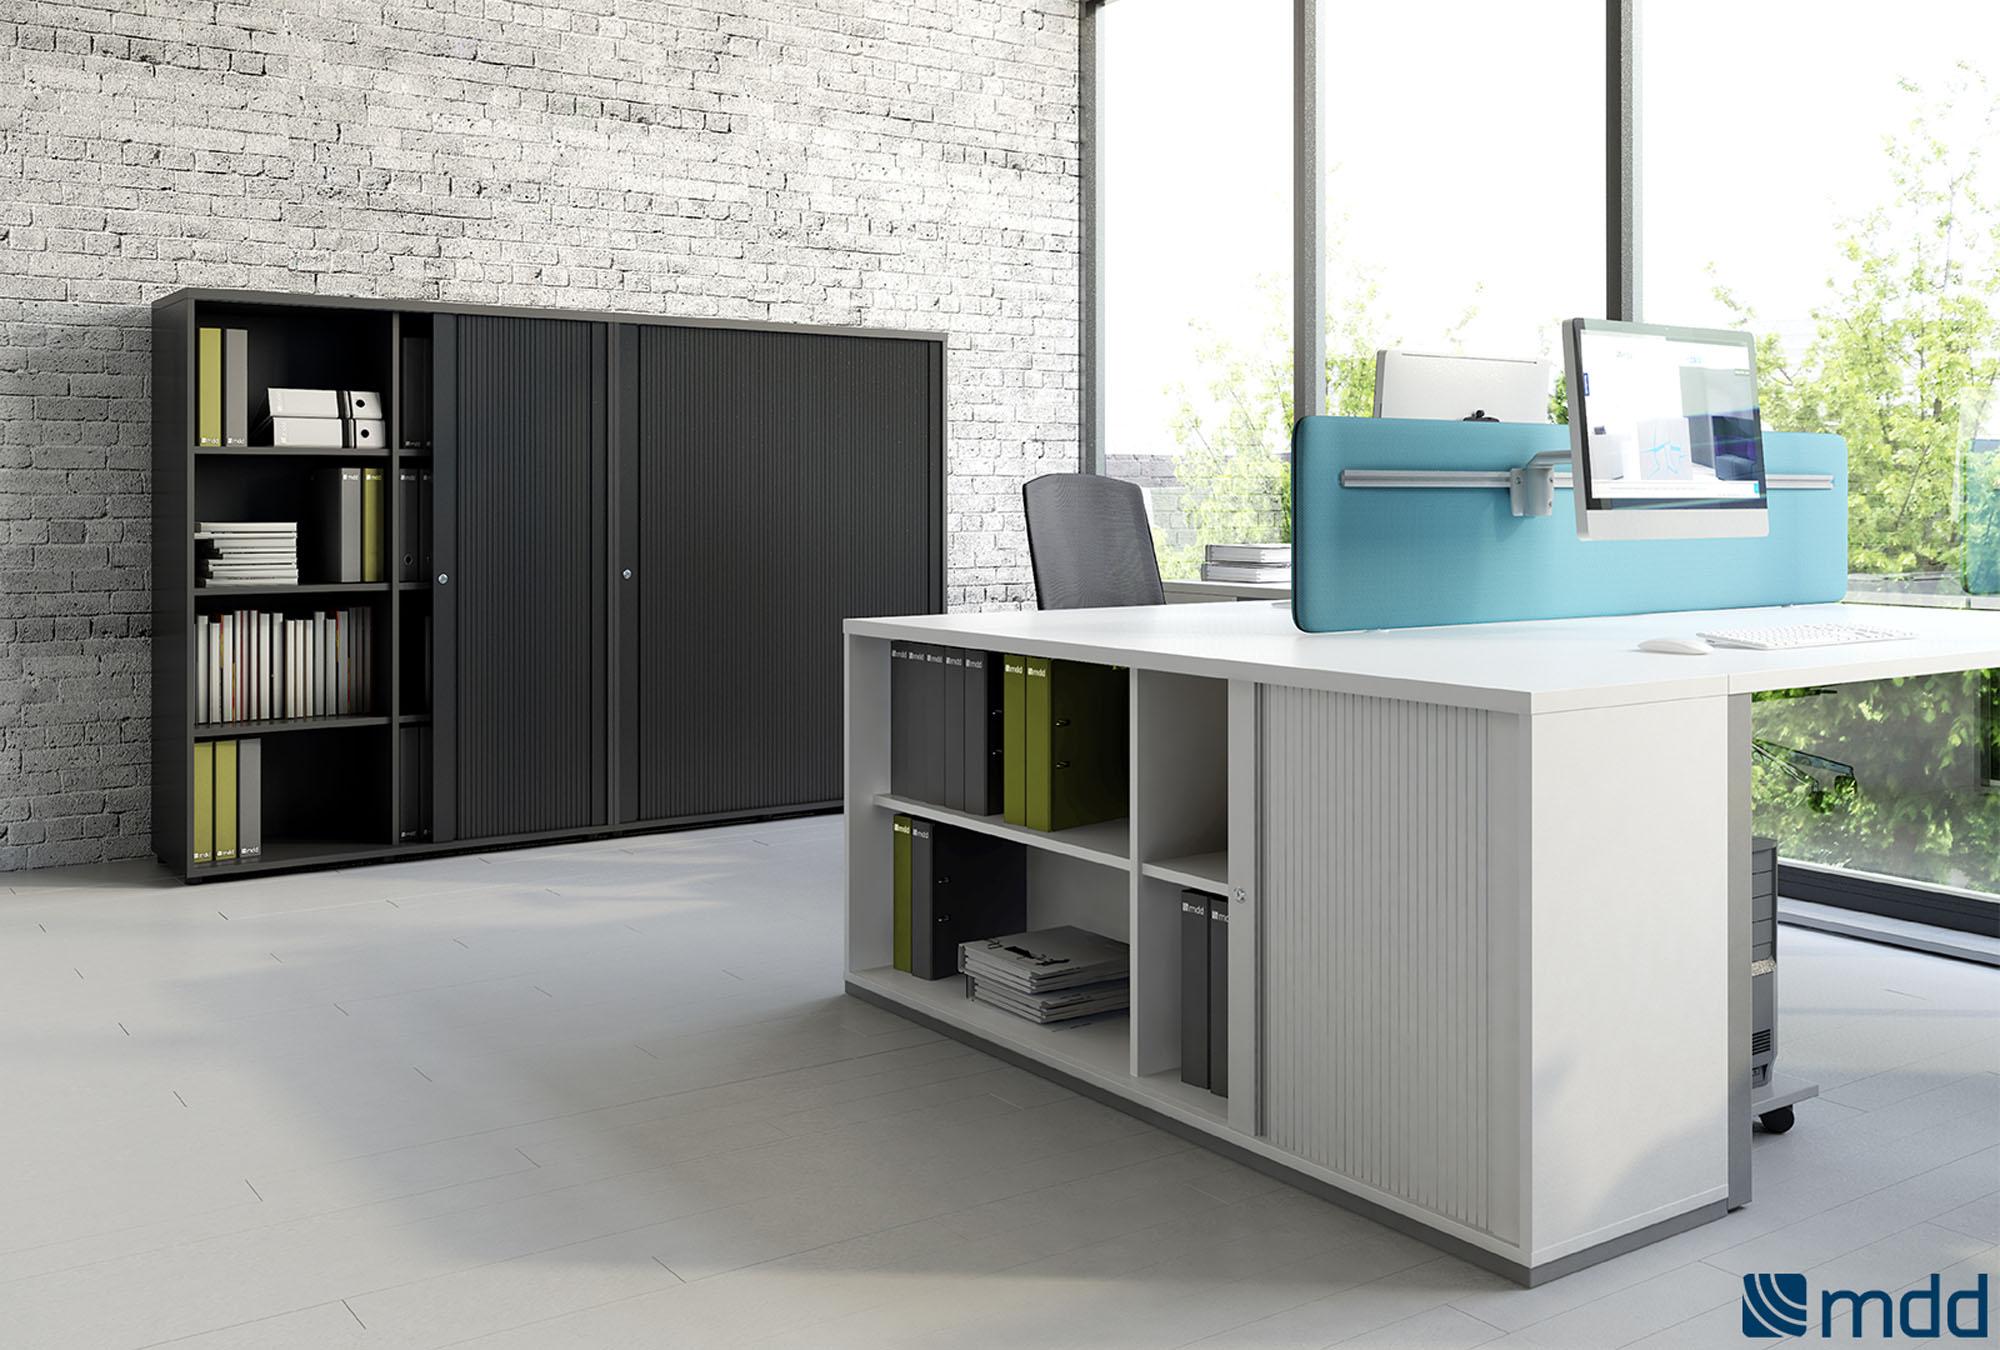 cr dences et armoires basses montpellier 34 n mes 30 s te. Black Bedroom Furniture Sets. Home Design Ideas